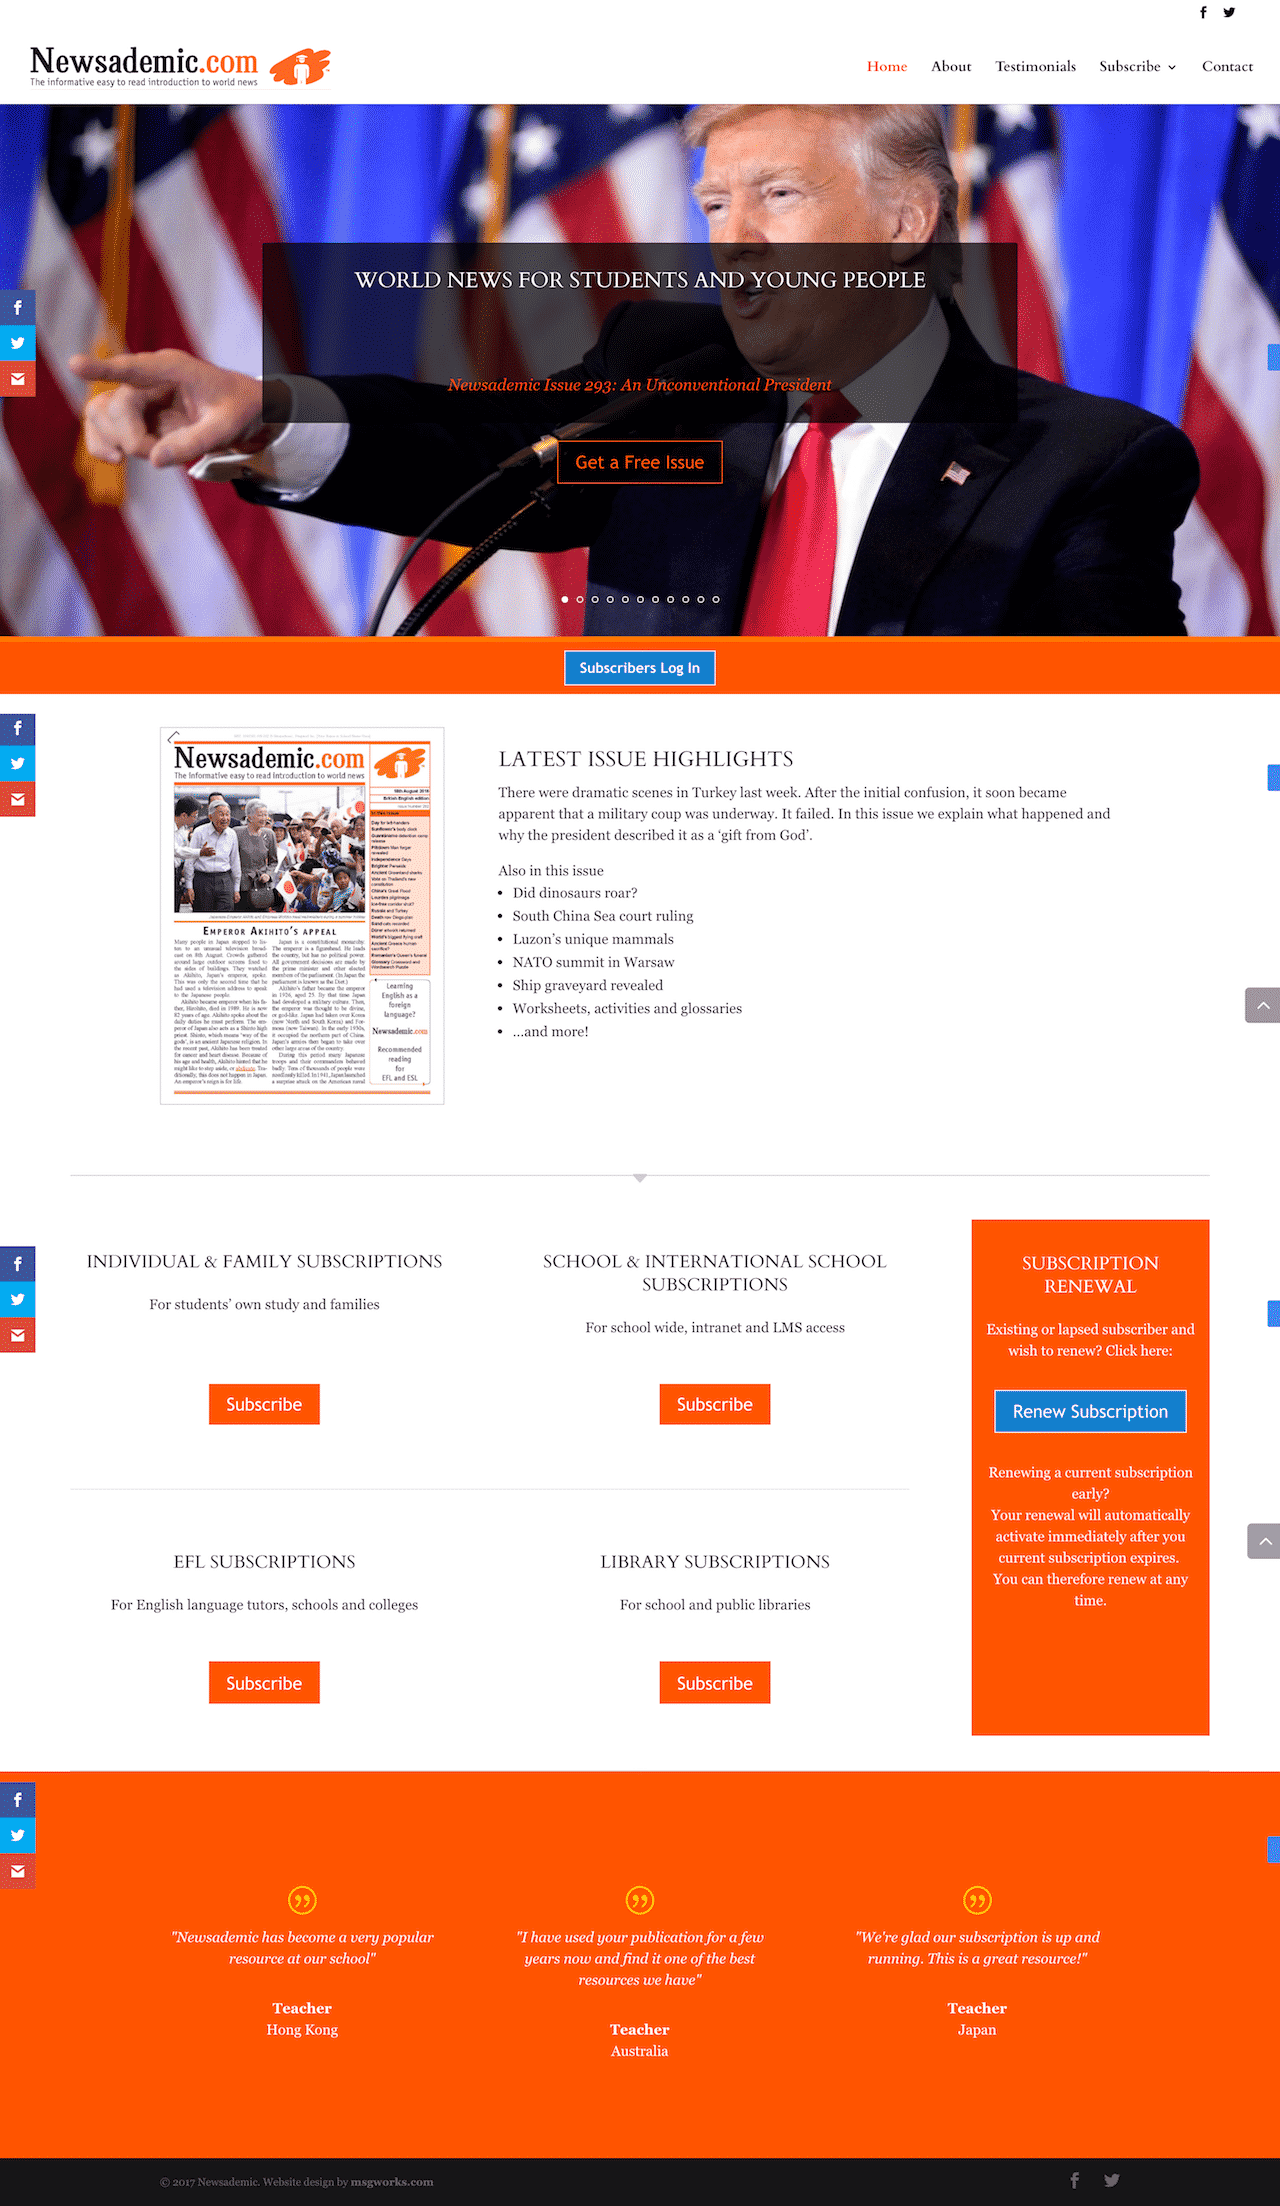 Newsademic Homepage Screenshot